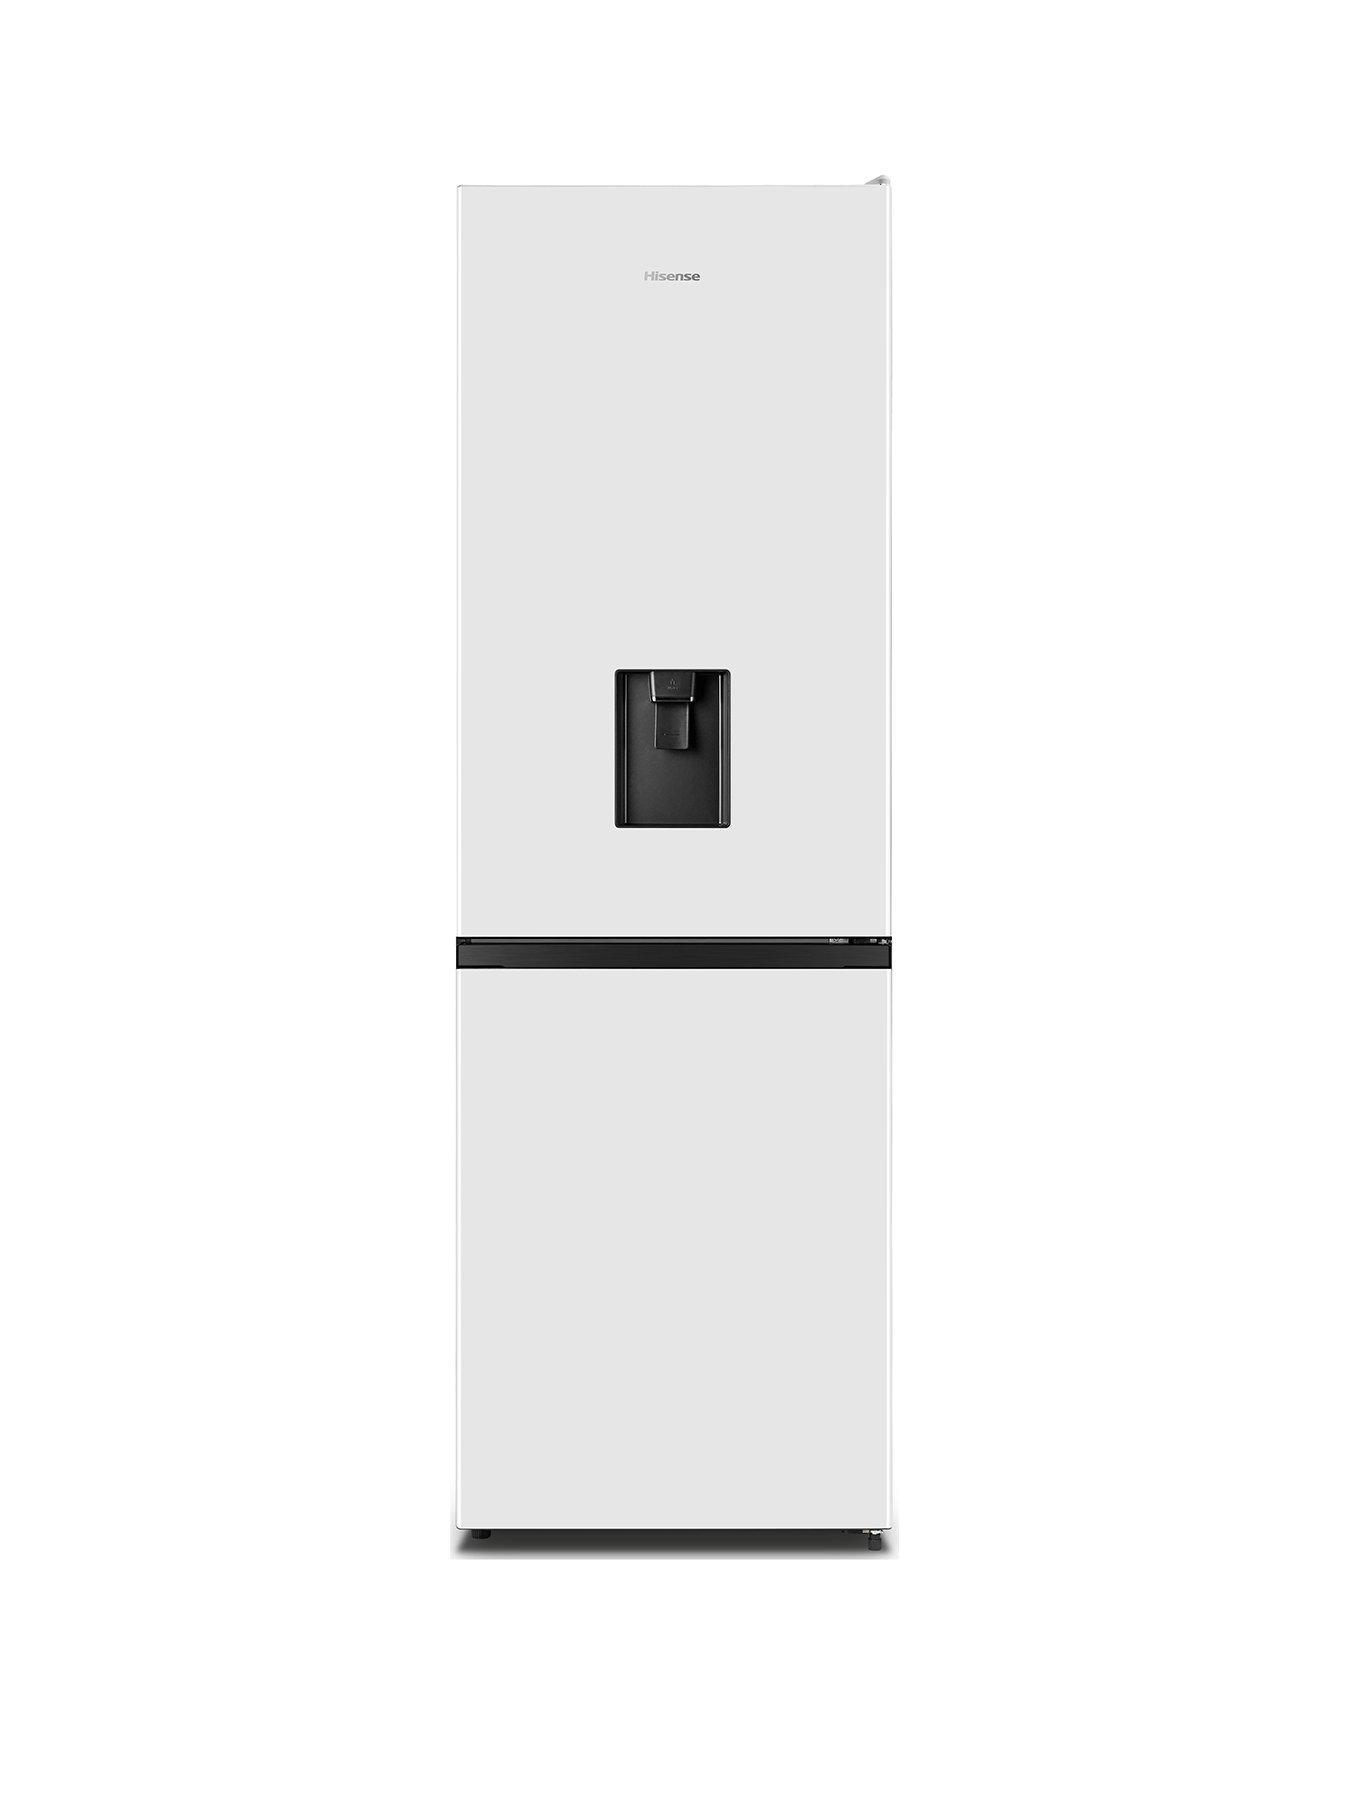 UNIVERSAL Oven Door Splash Guard Shield Cover 48 x 40cm Teflon Oven Liner